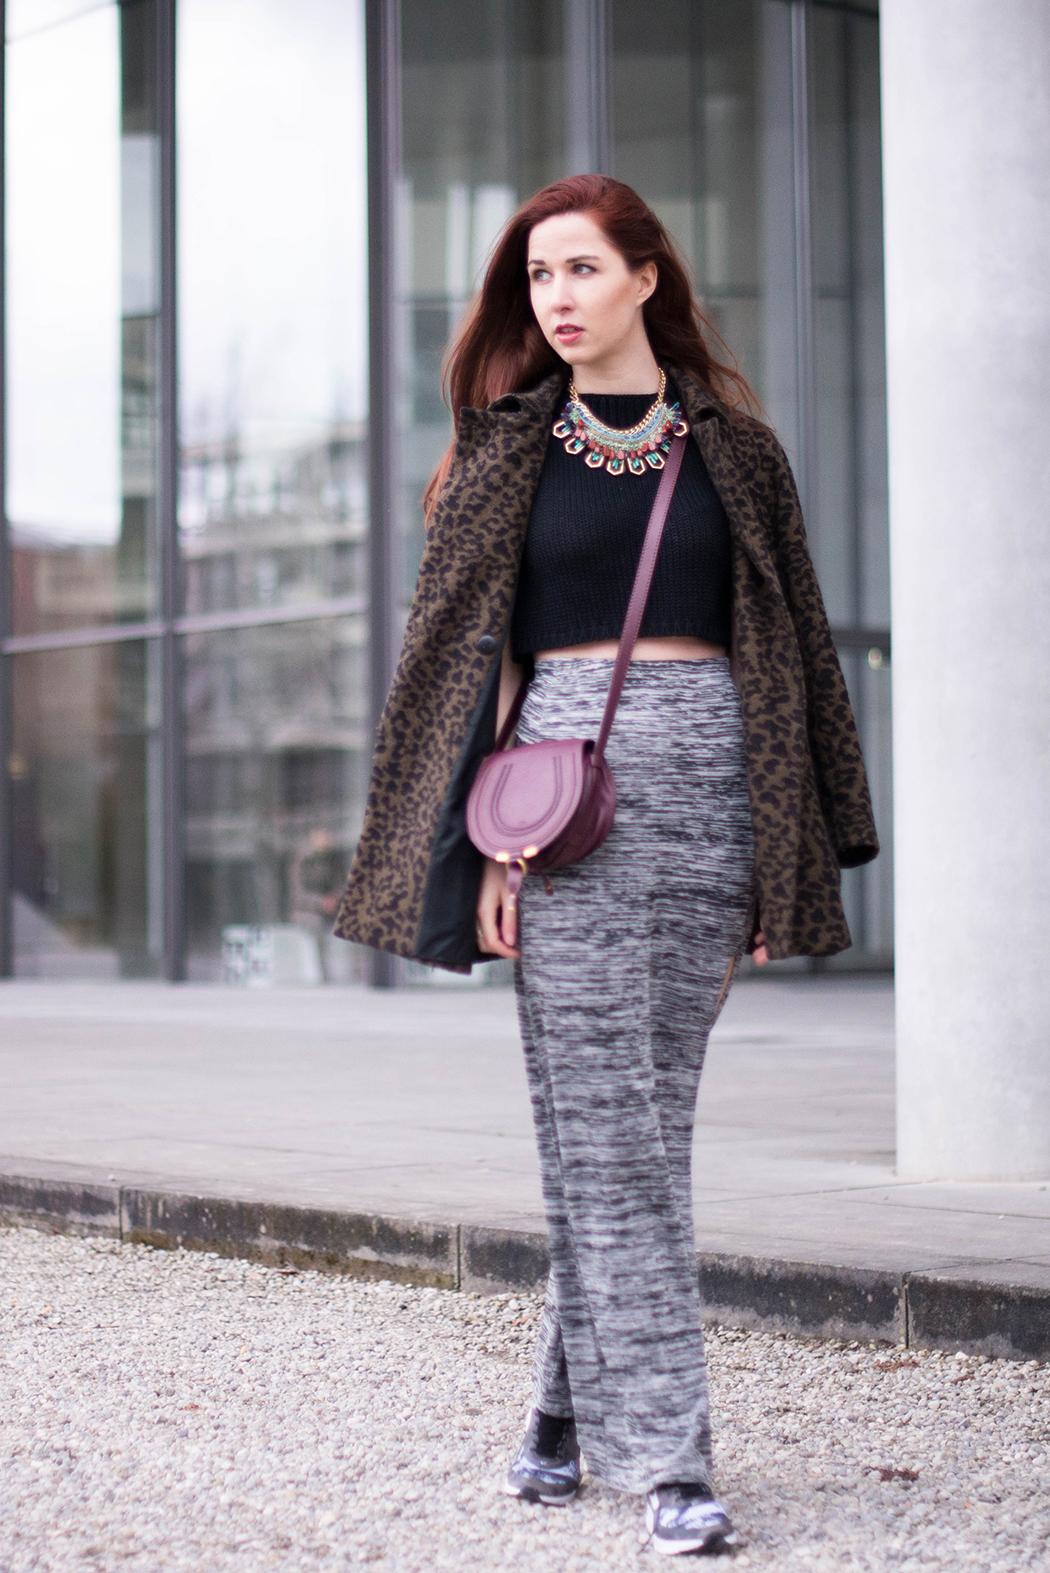 Fashionblogger-München-Fashionblog-Deutschland-Lindarella-Fitnessblogger-Nike-Air-Max-Military-Engelhorn-Chloe-Marcie-weinrot-rot-Crop-Top-Strick-1-